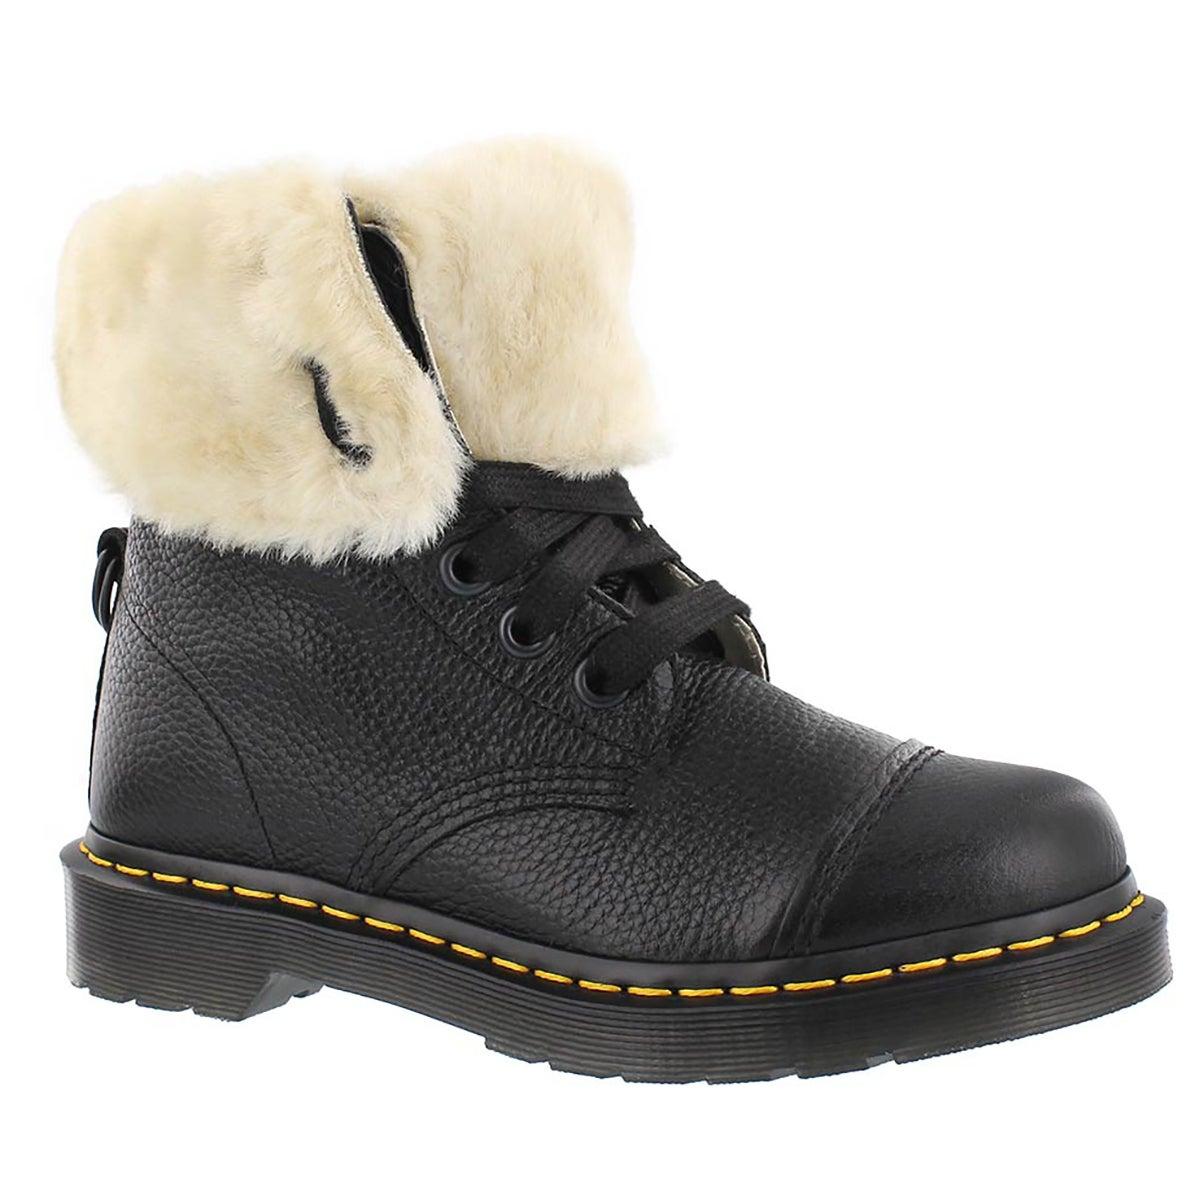 Lds Aimilita FL 9-eye black combat boot